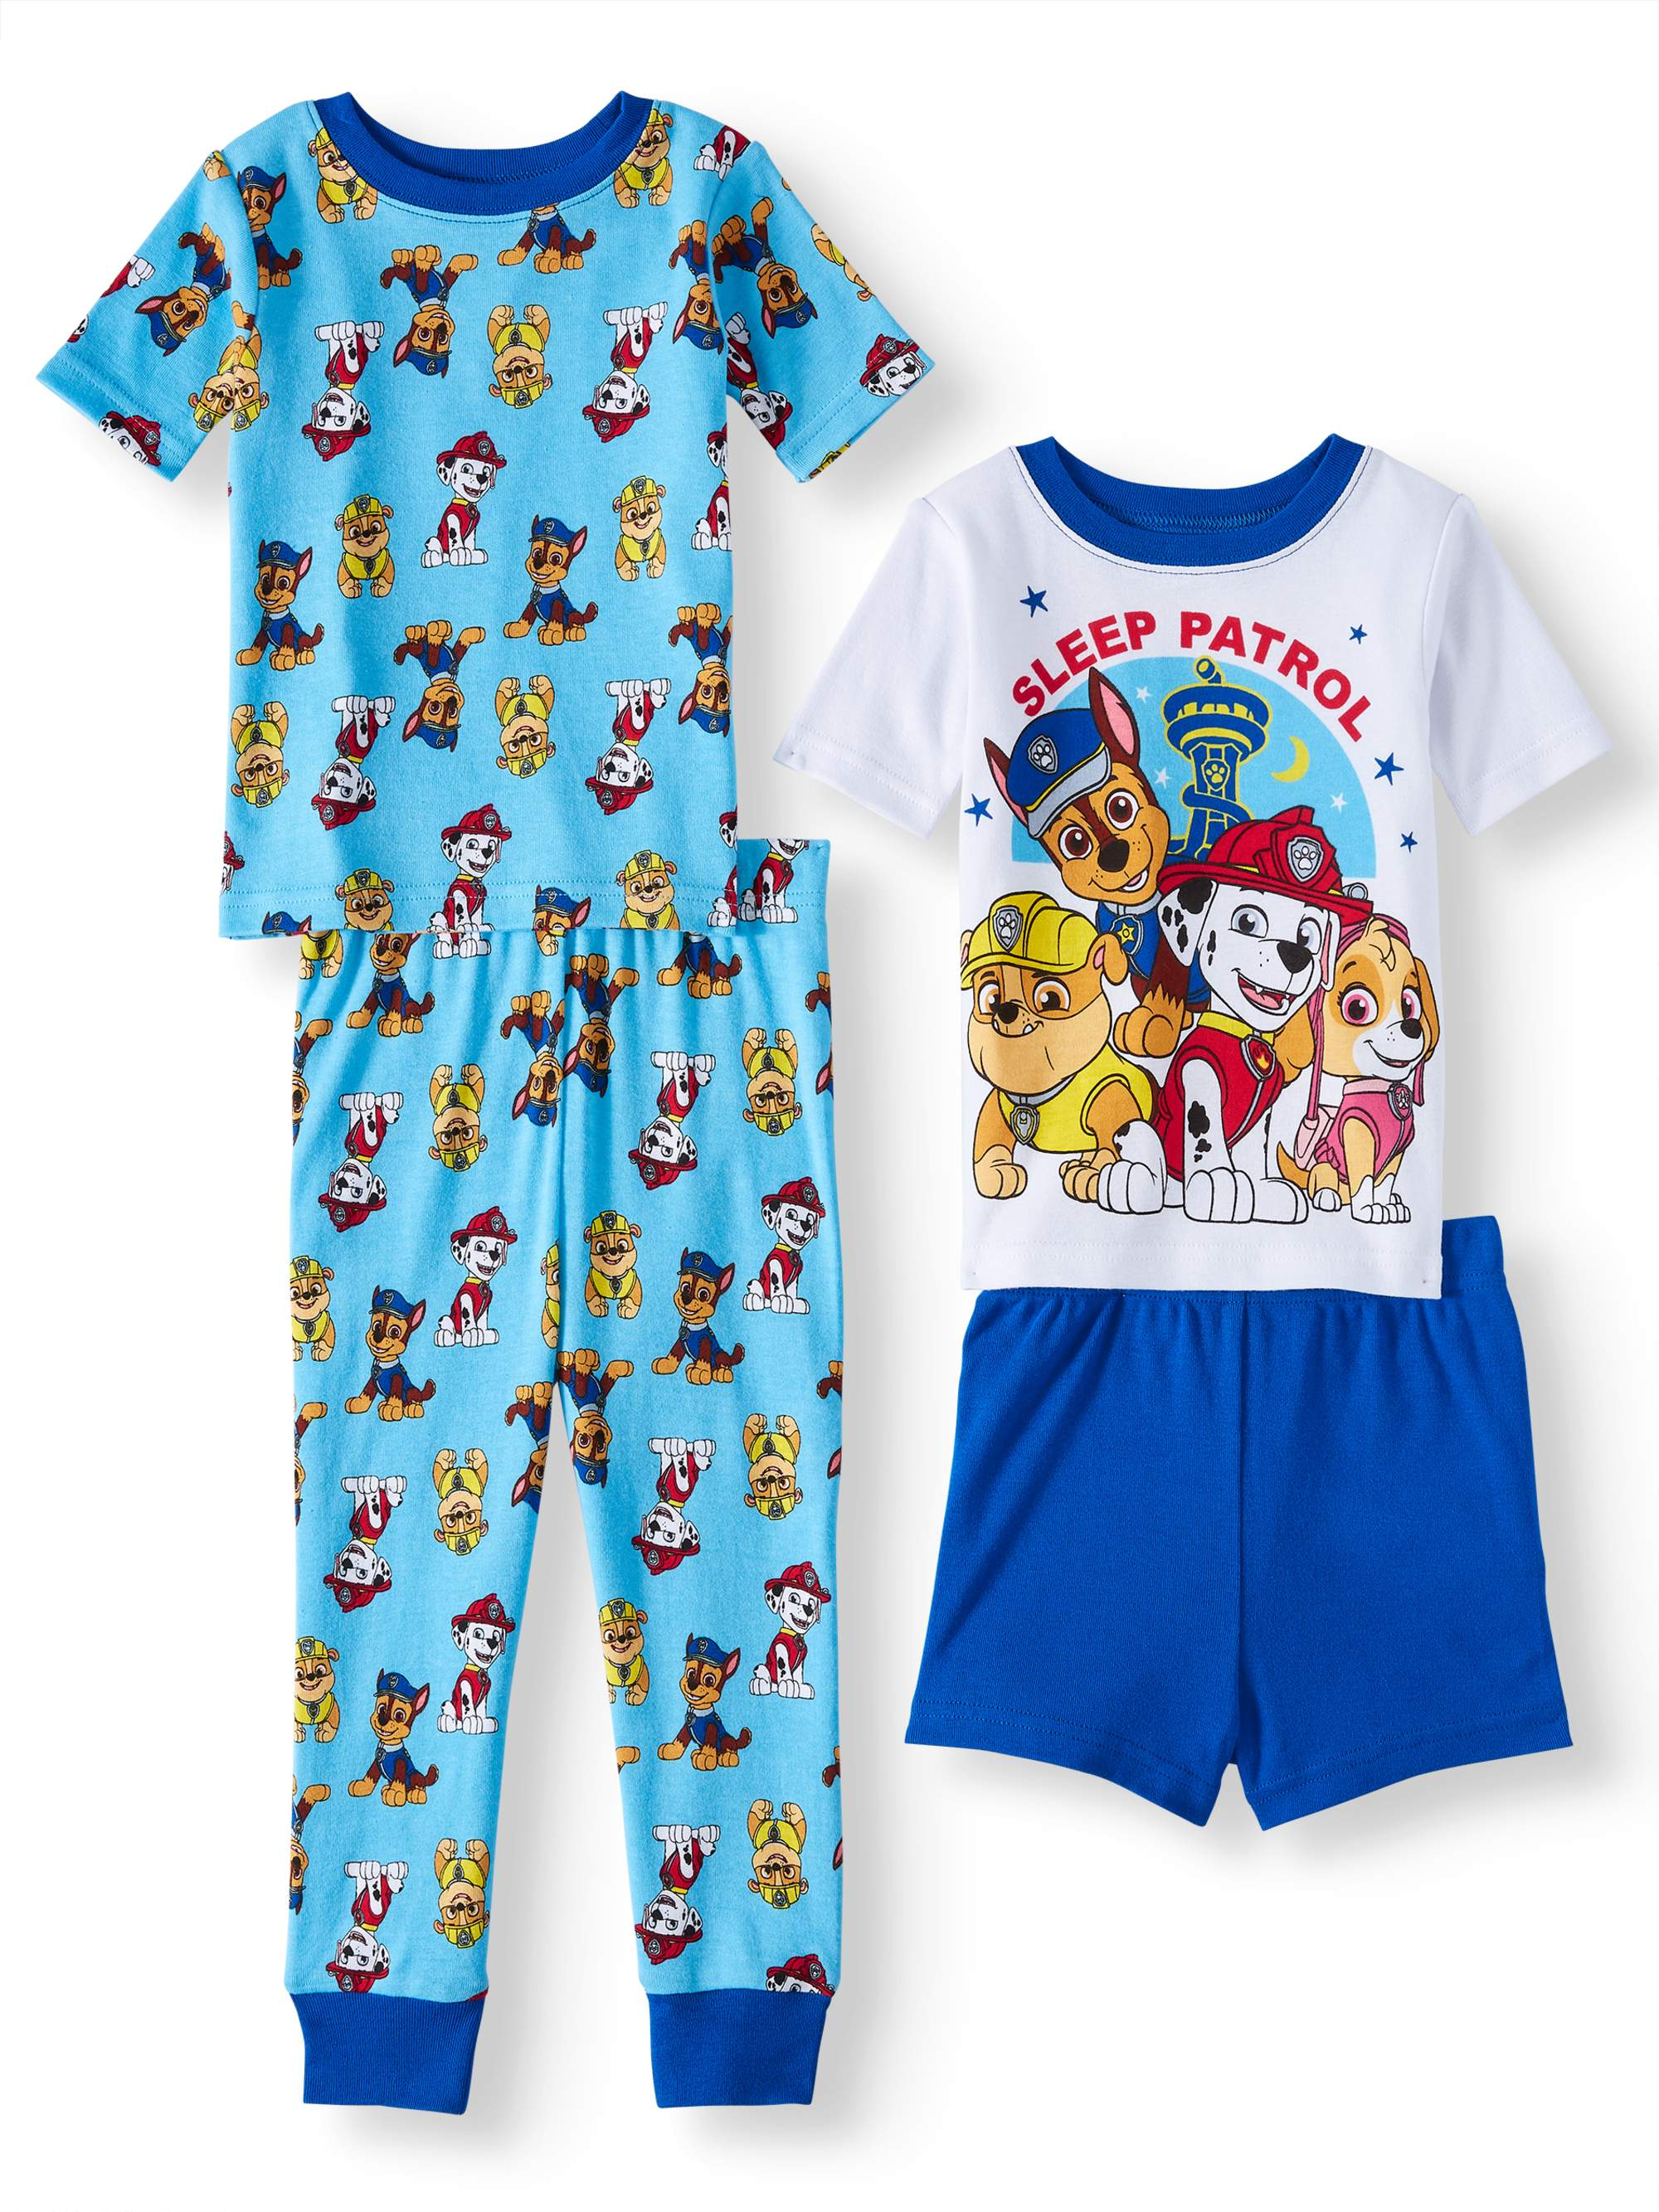 Cotton Tight Fit Pajamas, 4pc Set (Toddler Boys)